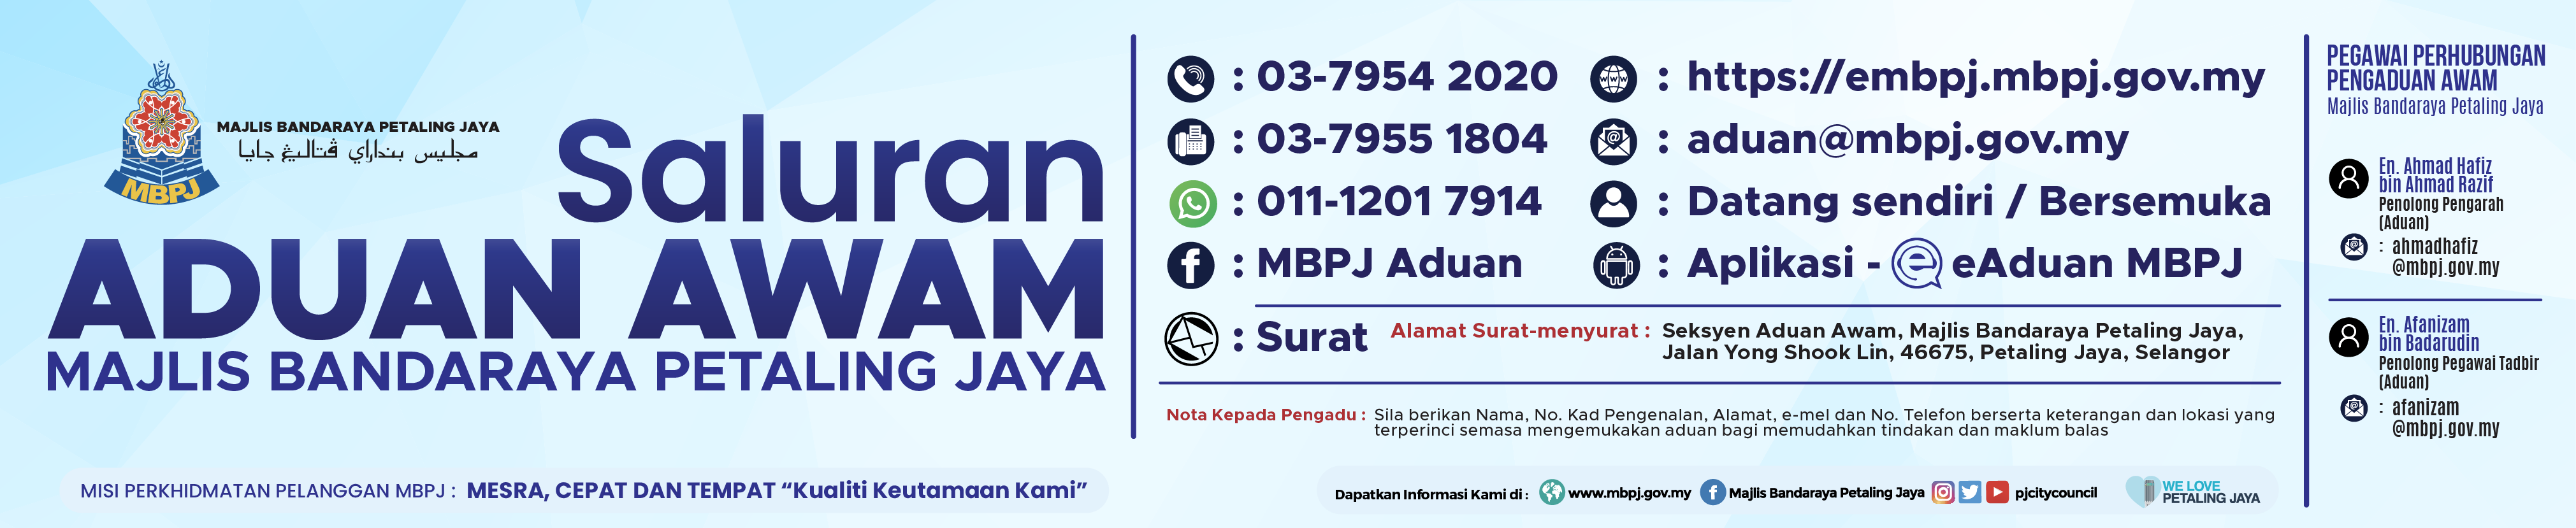 Banner Saluran Aduan MBPJ